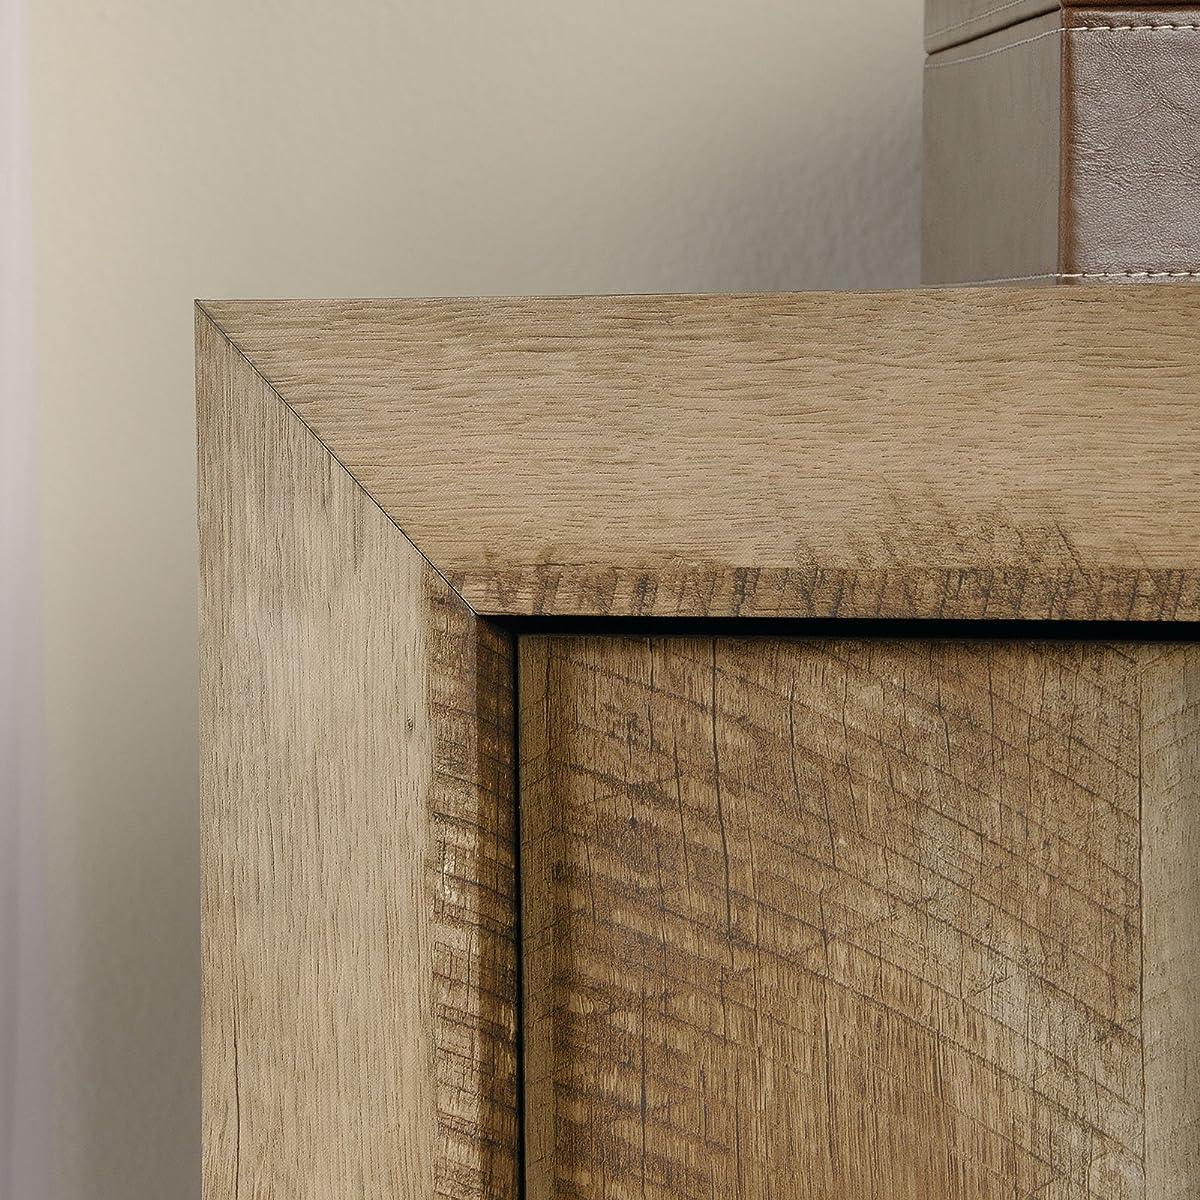 Sauder Dakota Pass Armoire in Craftsman Oak